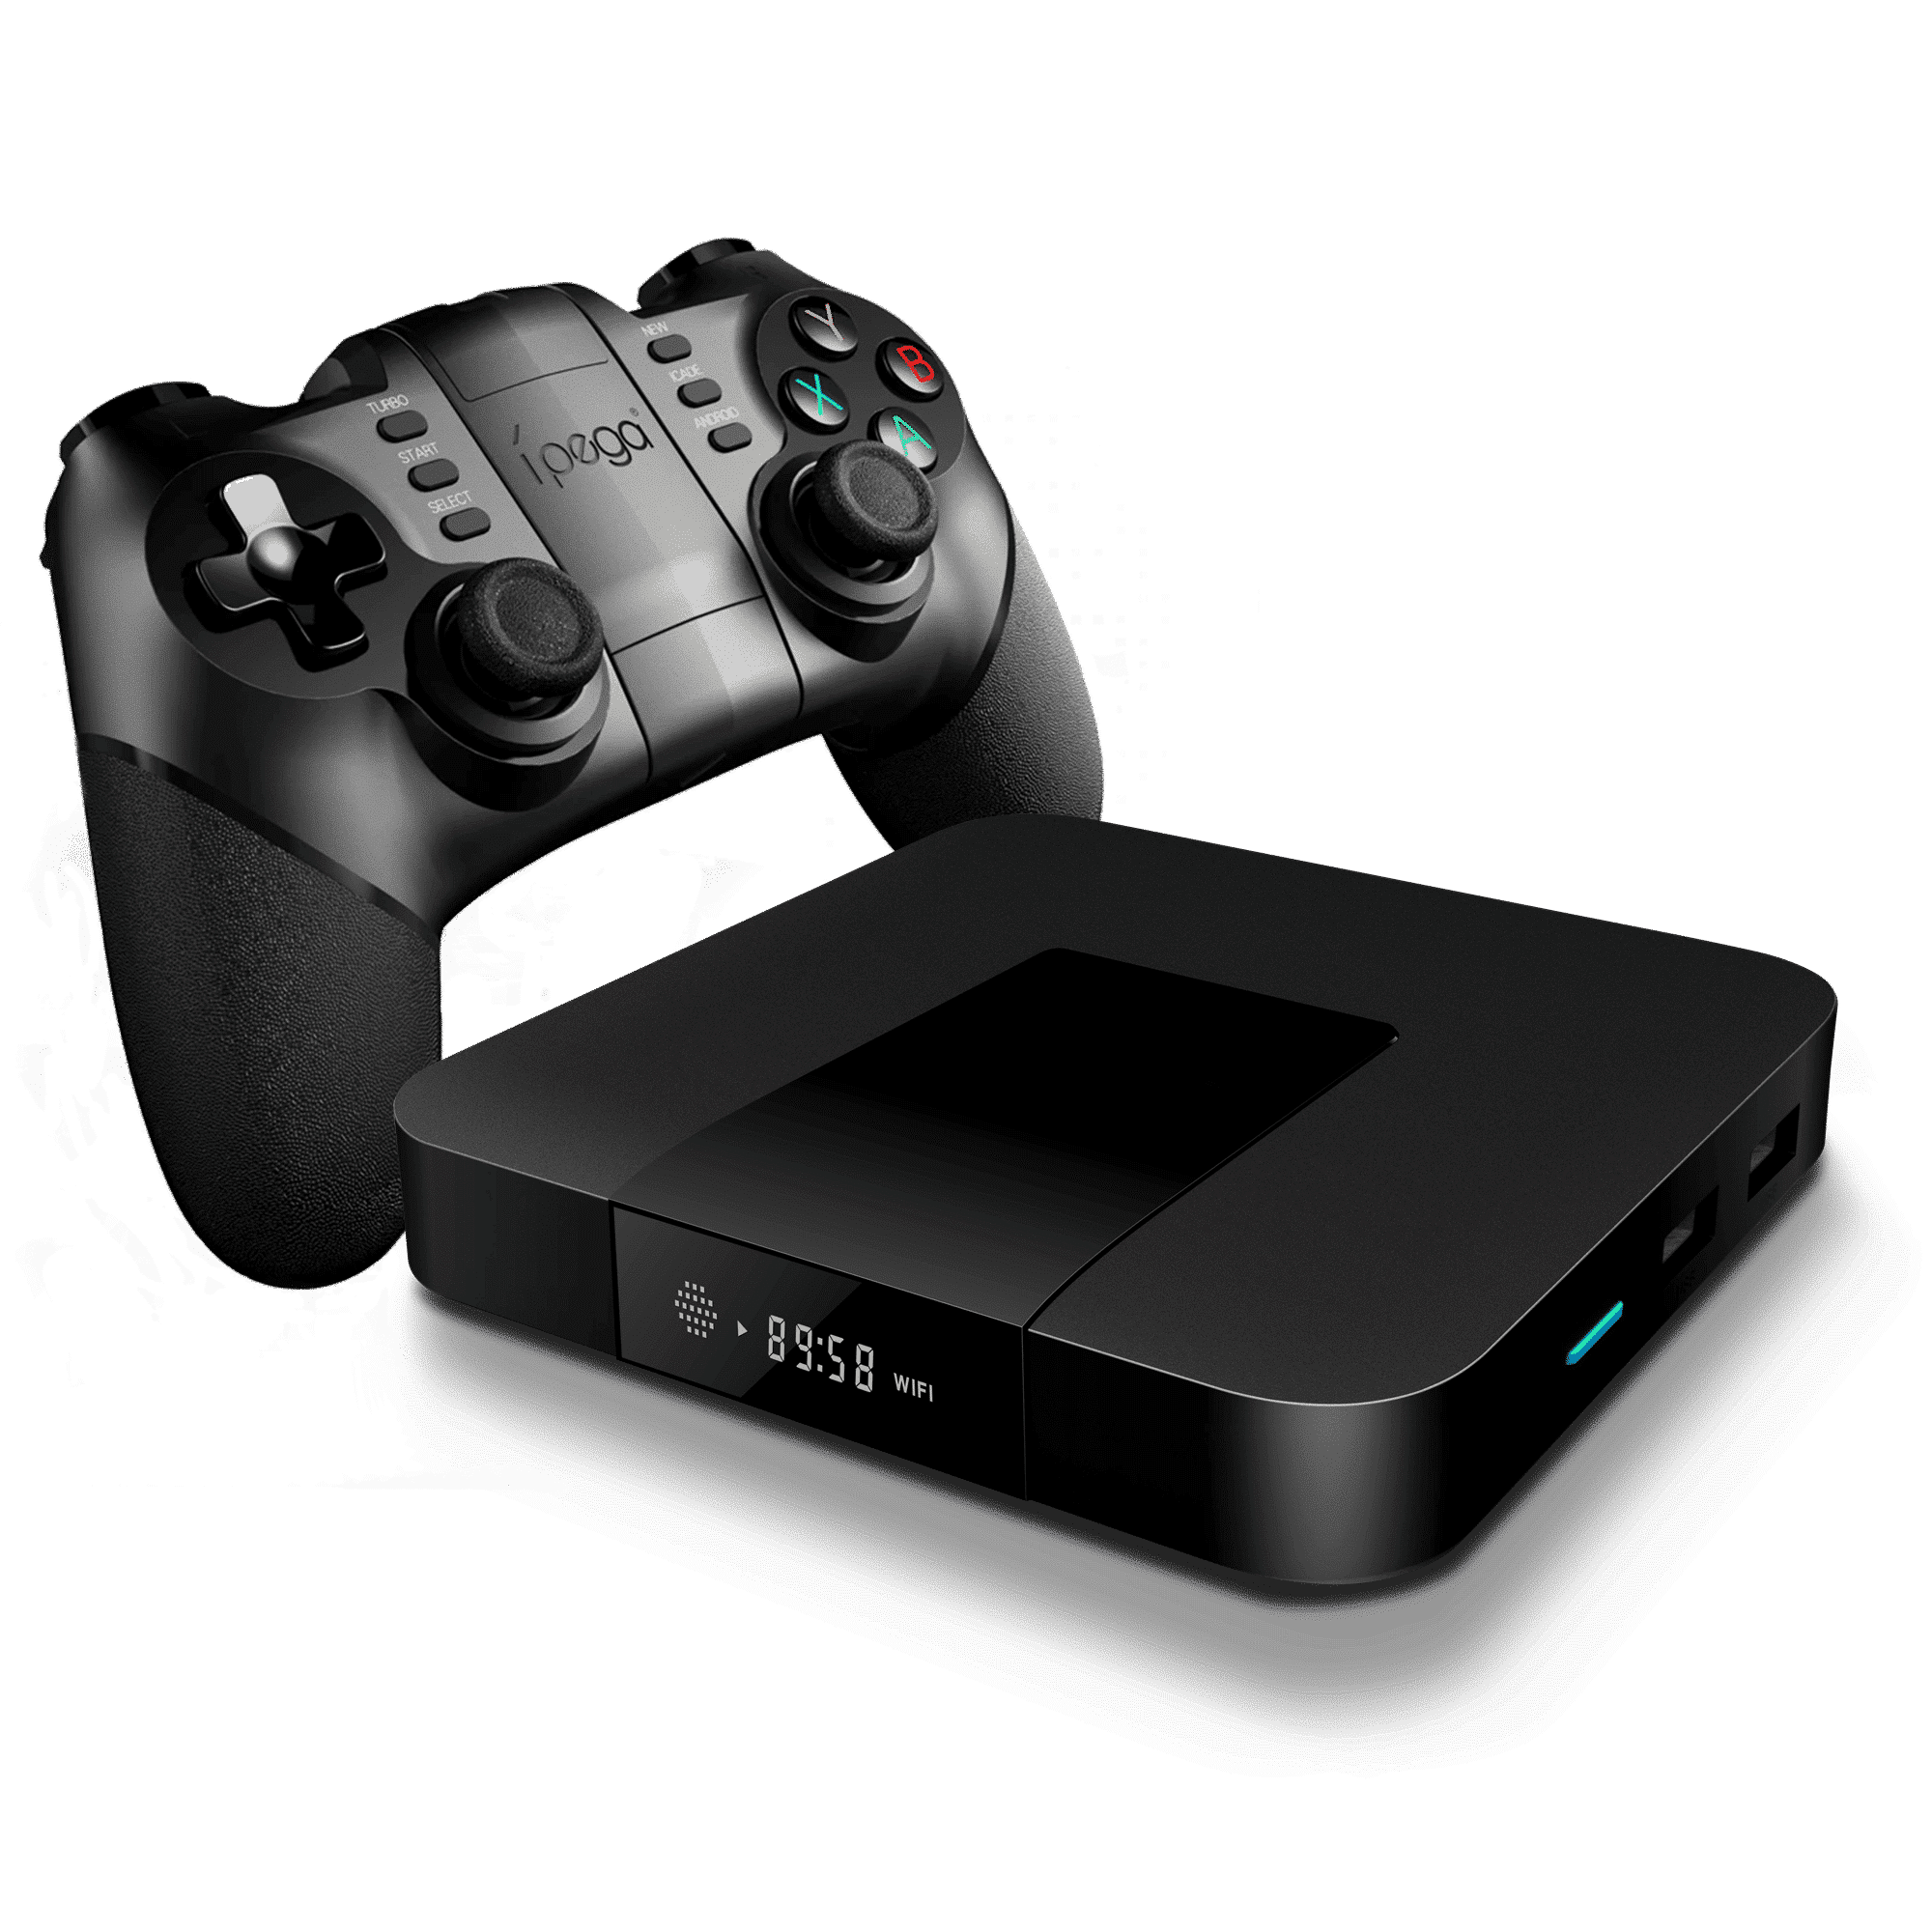 iMXQpro Mini Retro-Gaming Edition with the iPega 9076 Wireless Gamepad